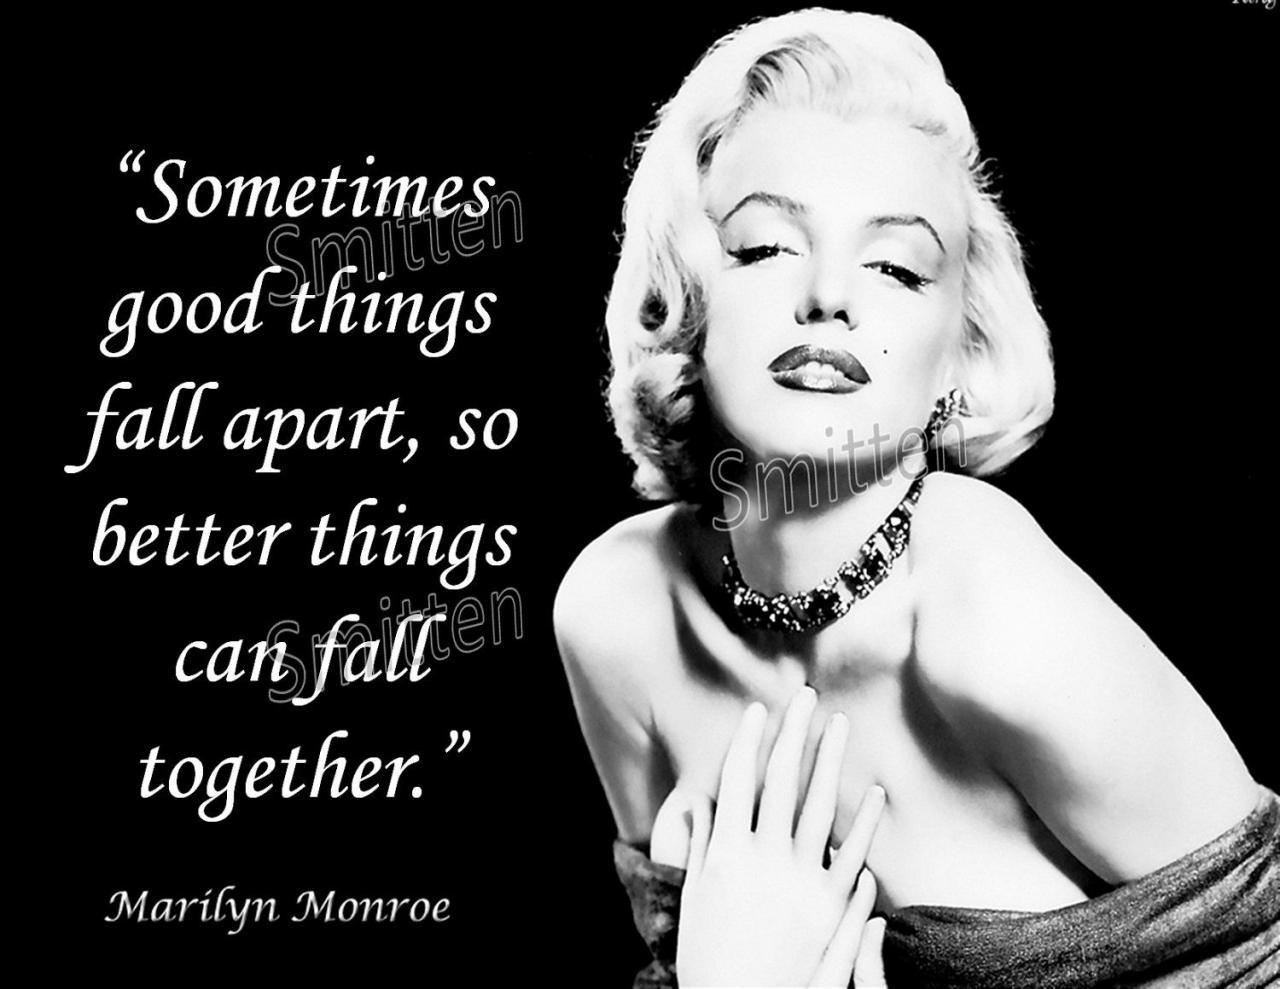 Marilyn Monroe Love Quotes Tumblr Hd Marilyn Monroe Quotes Quotespoem Wallpaper Hd